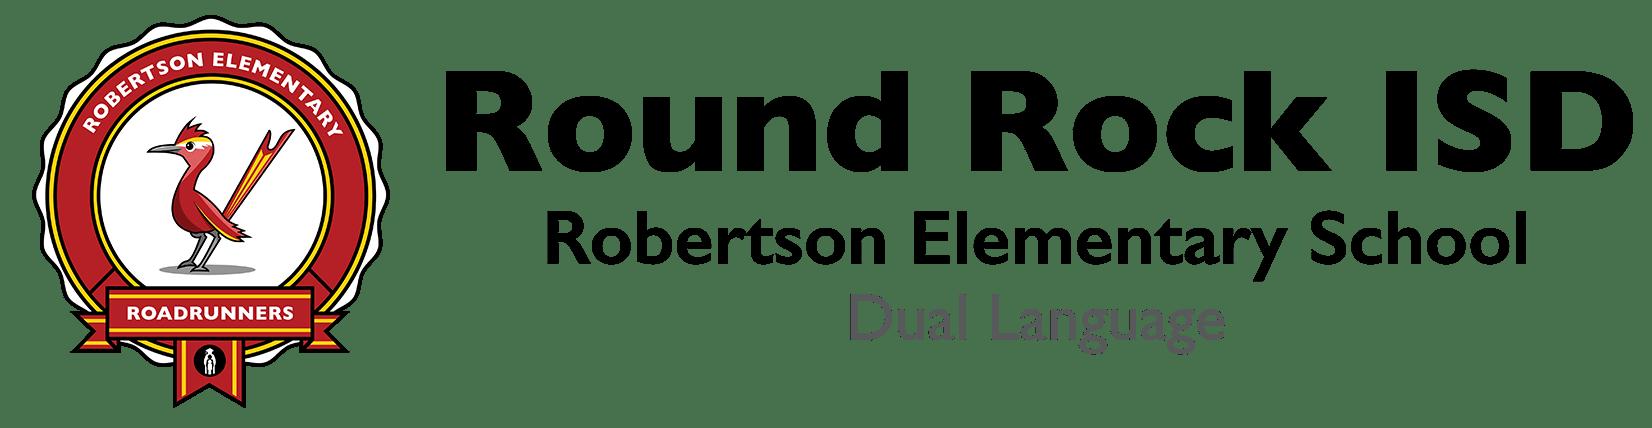 Robertson Elementary School